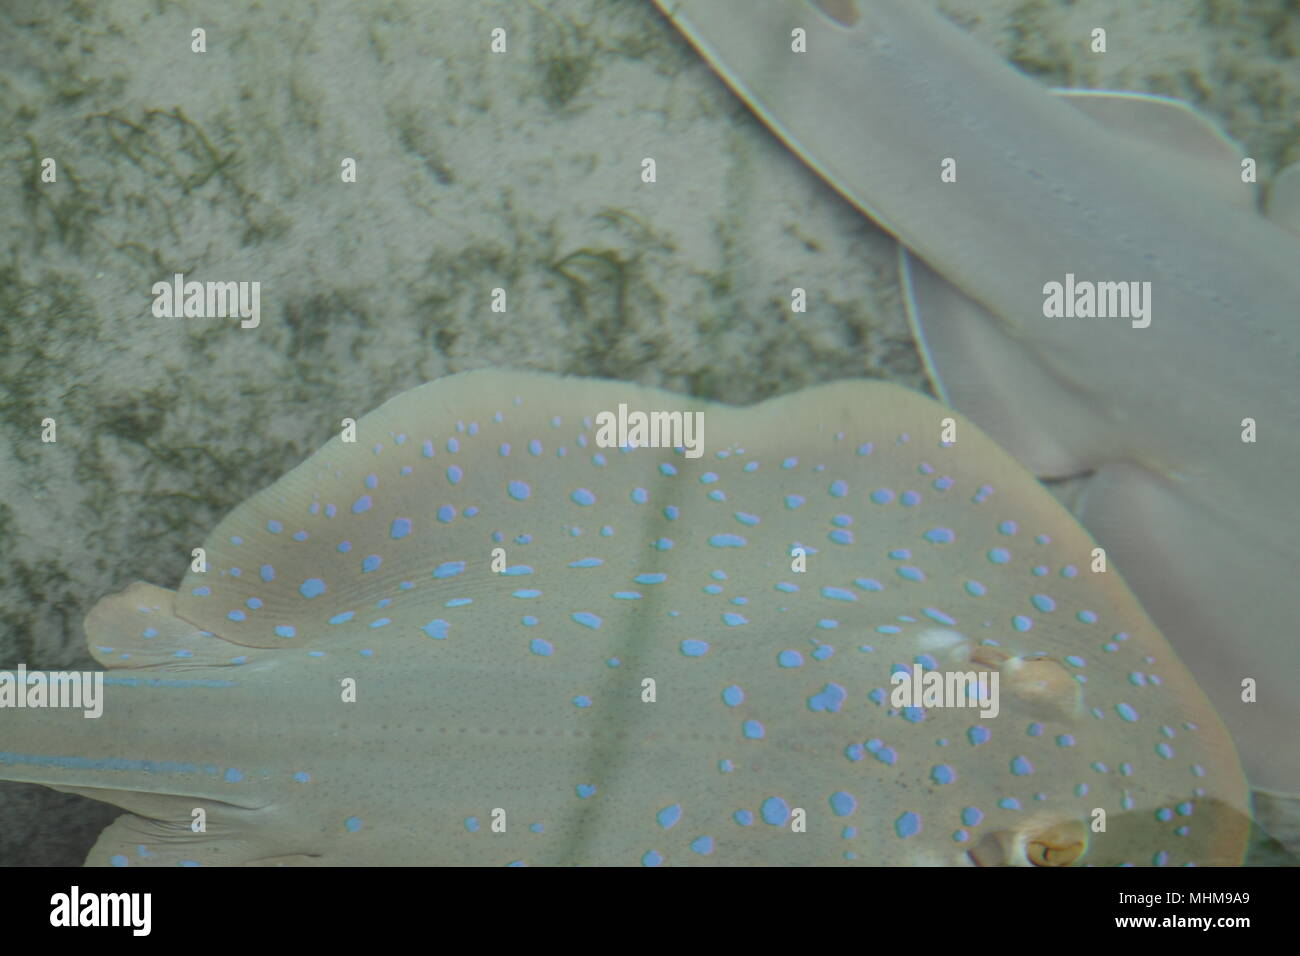 Bluespotted Fantail Rays (Taeniura Lymma) - Stock Image